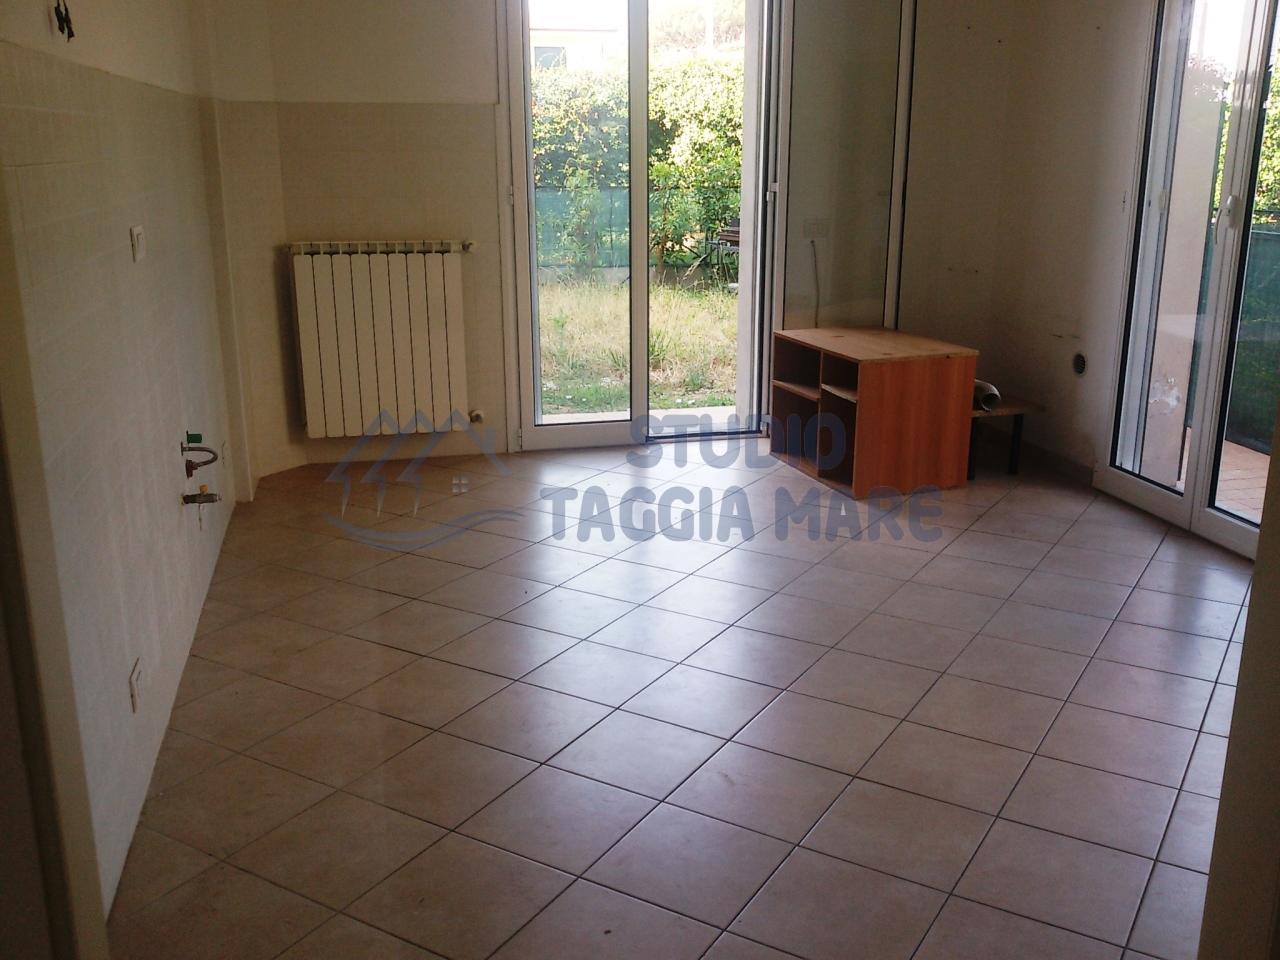 Bilocale Taggia Via San Francesco 453 4